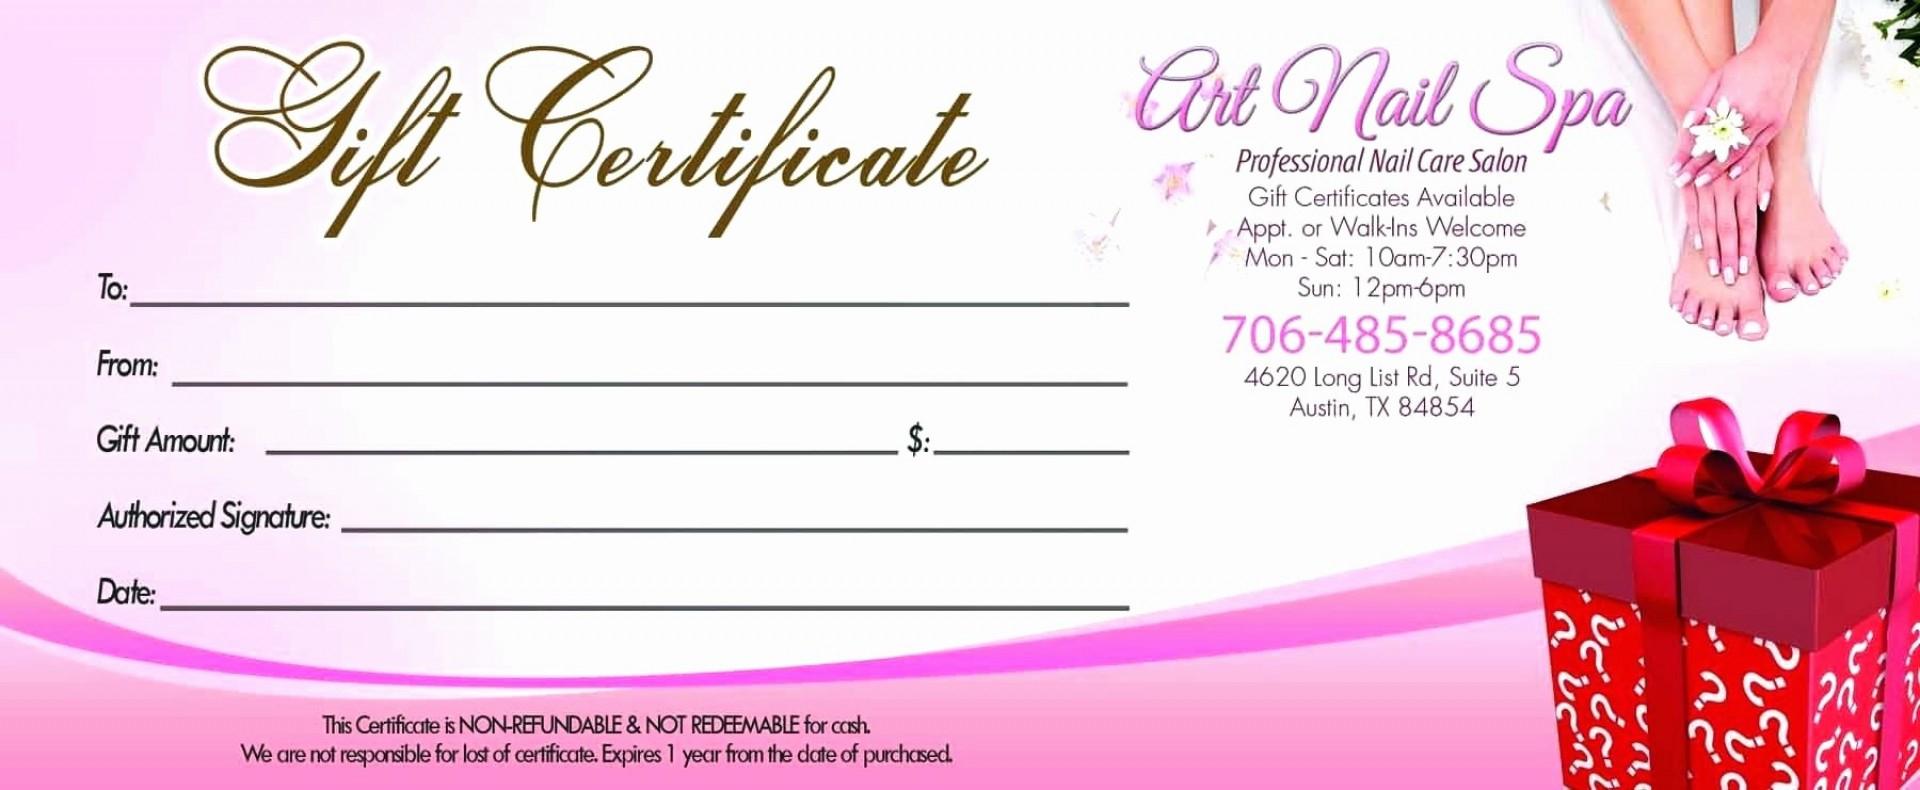 011 Template Ideas Salon Gift Amazing Certificate Printable With Nail Gift Certificate Template Free